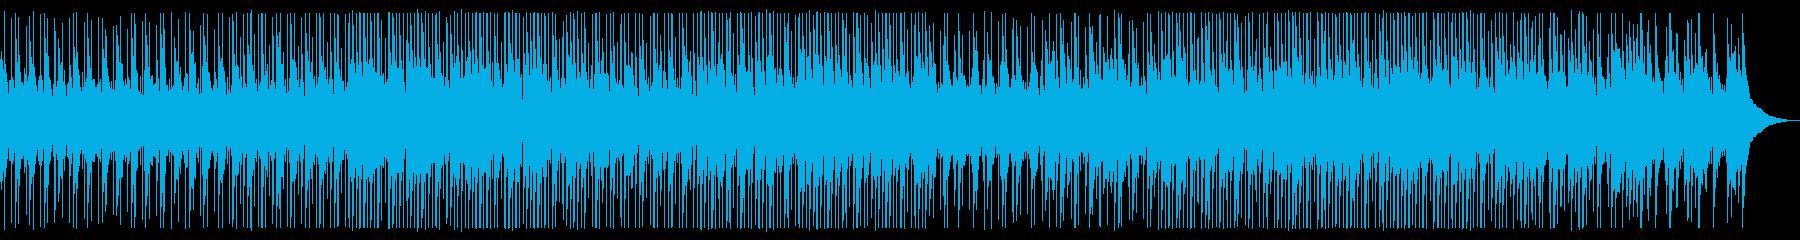 YOUTUBE,CM等に元気なウクレレ曲の再生済みの波形